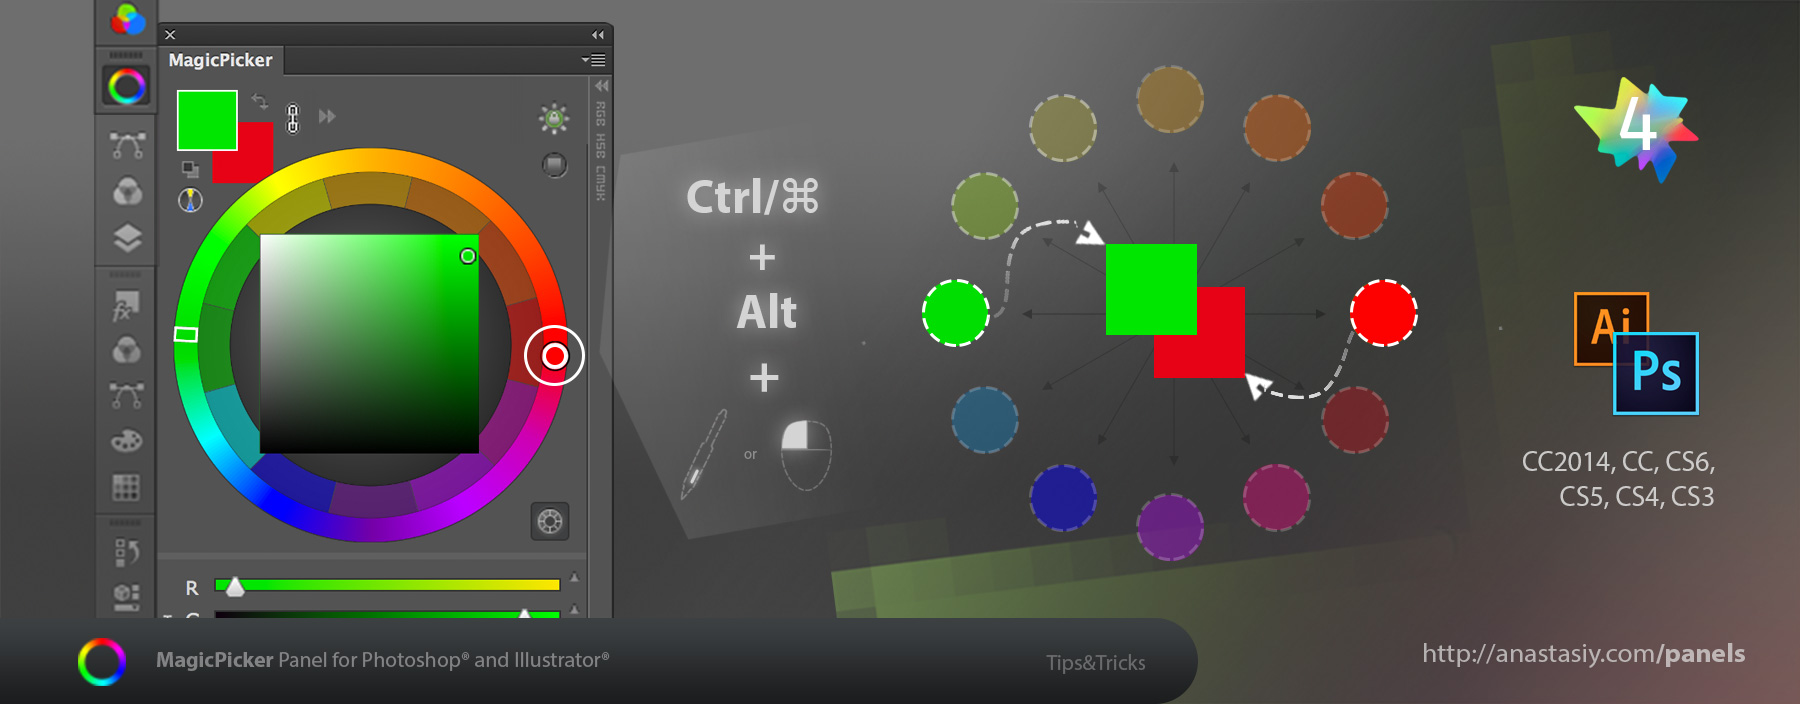 Secondary colors in MagicPicker (color schemes)